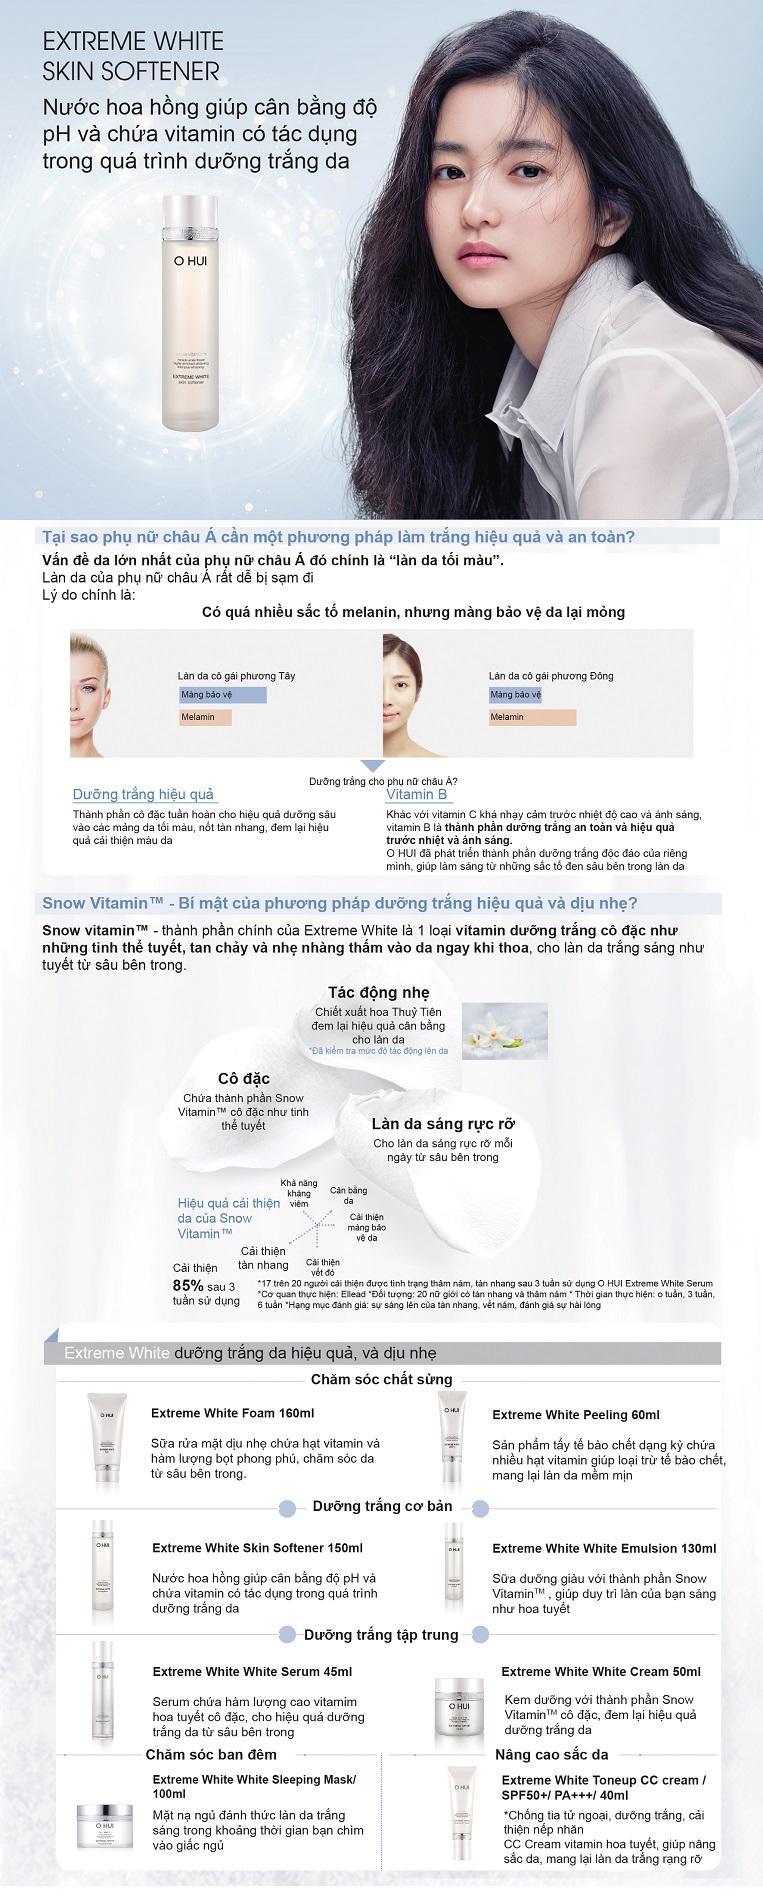 FI50243038 Extreme White Skin Softener.jpg